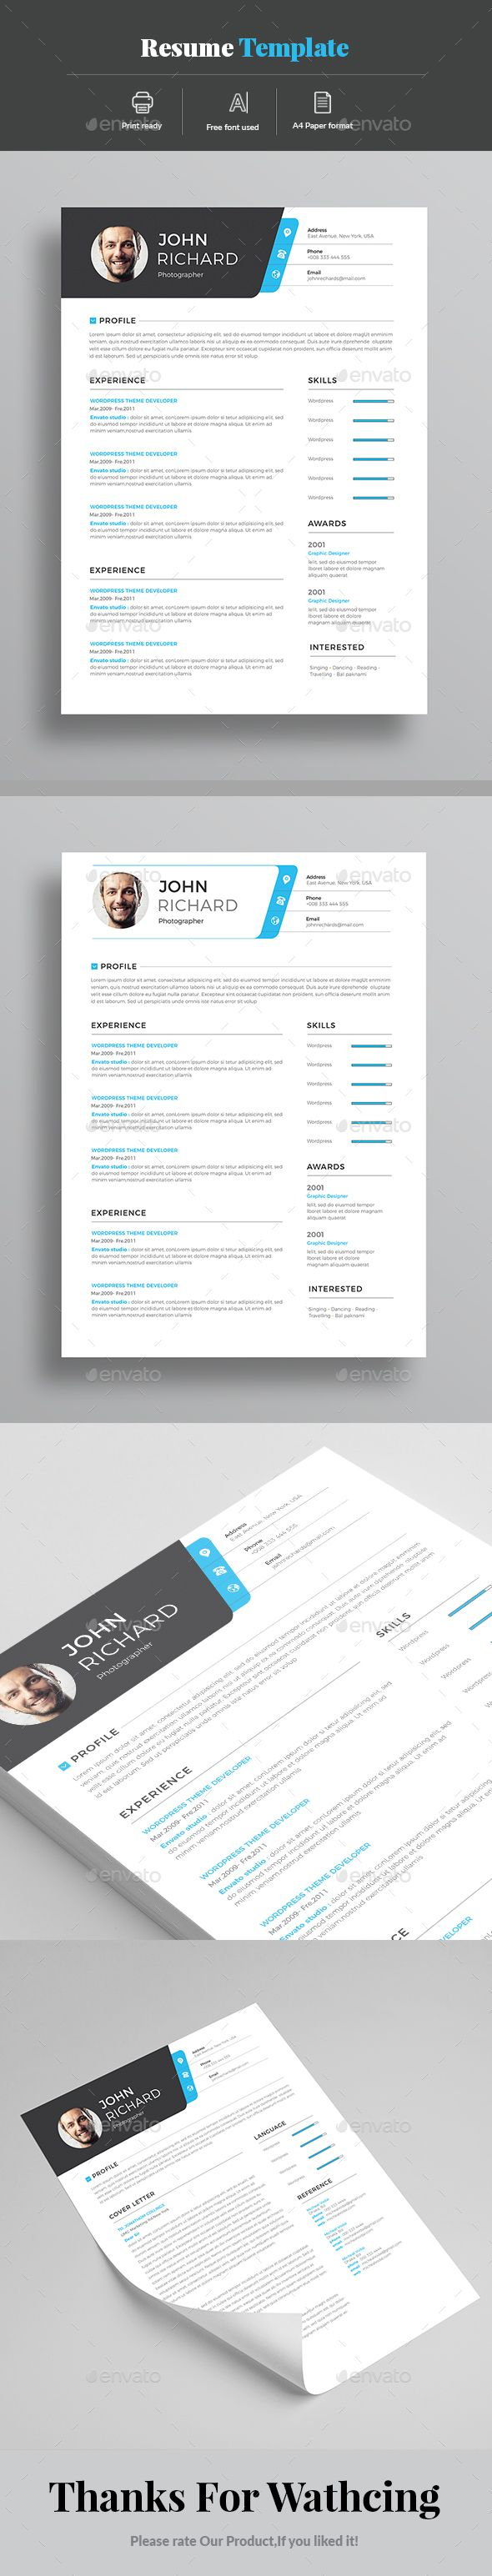 Resume Best 79 Resume Design ideas on